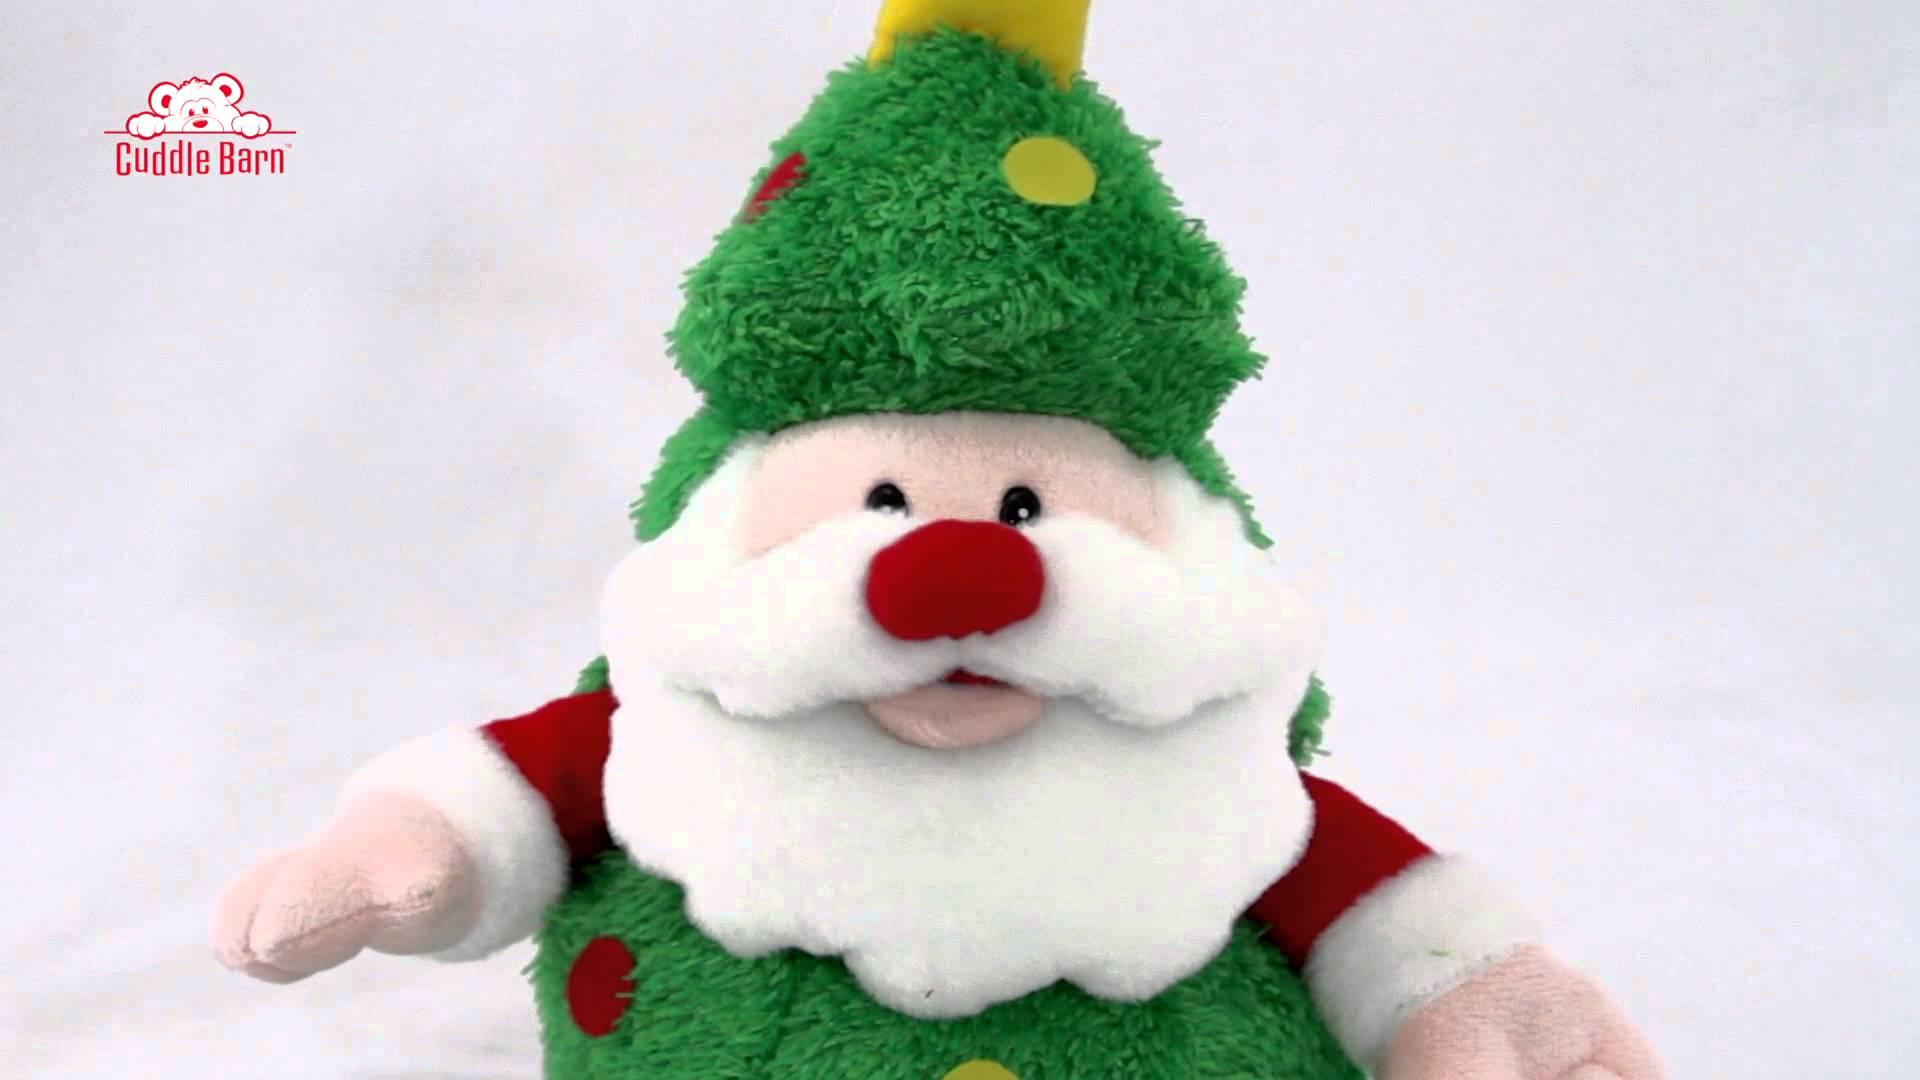 Animated Christmas Toys : Cuddle barn animated plush toy christmas jolly st nick